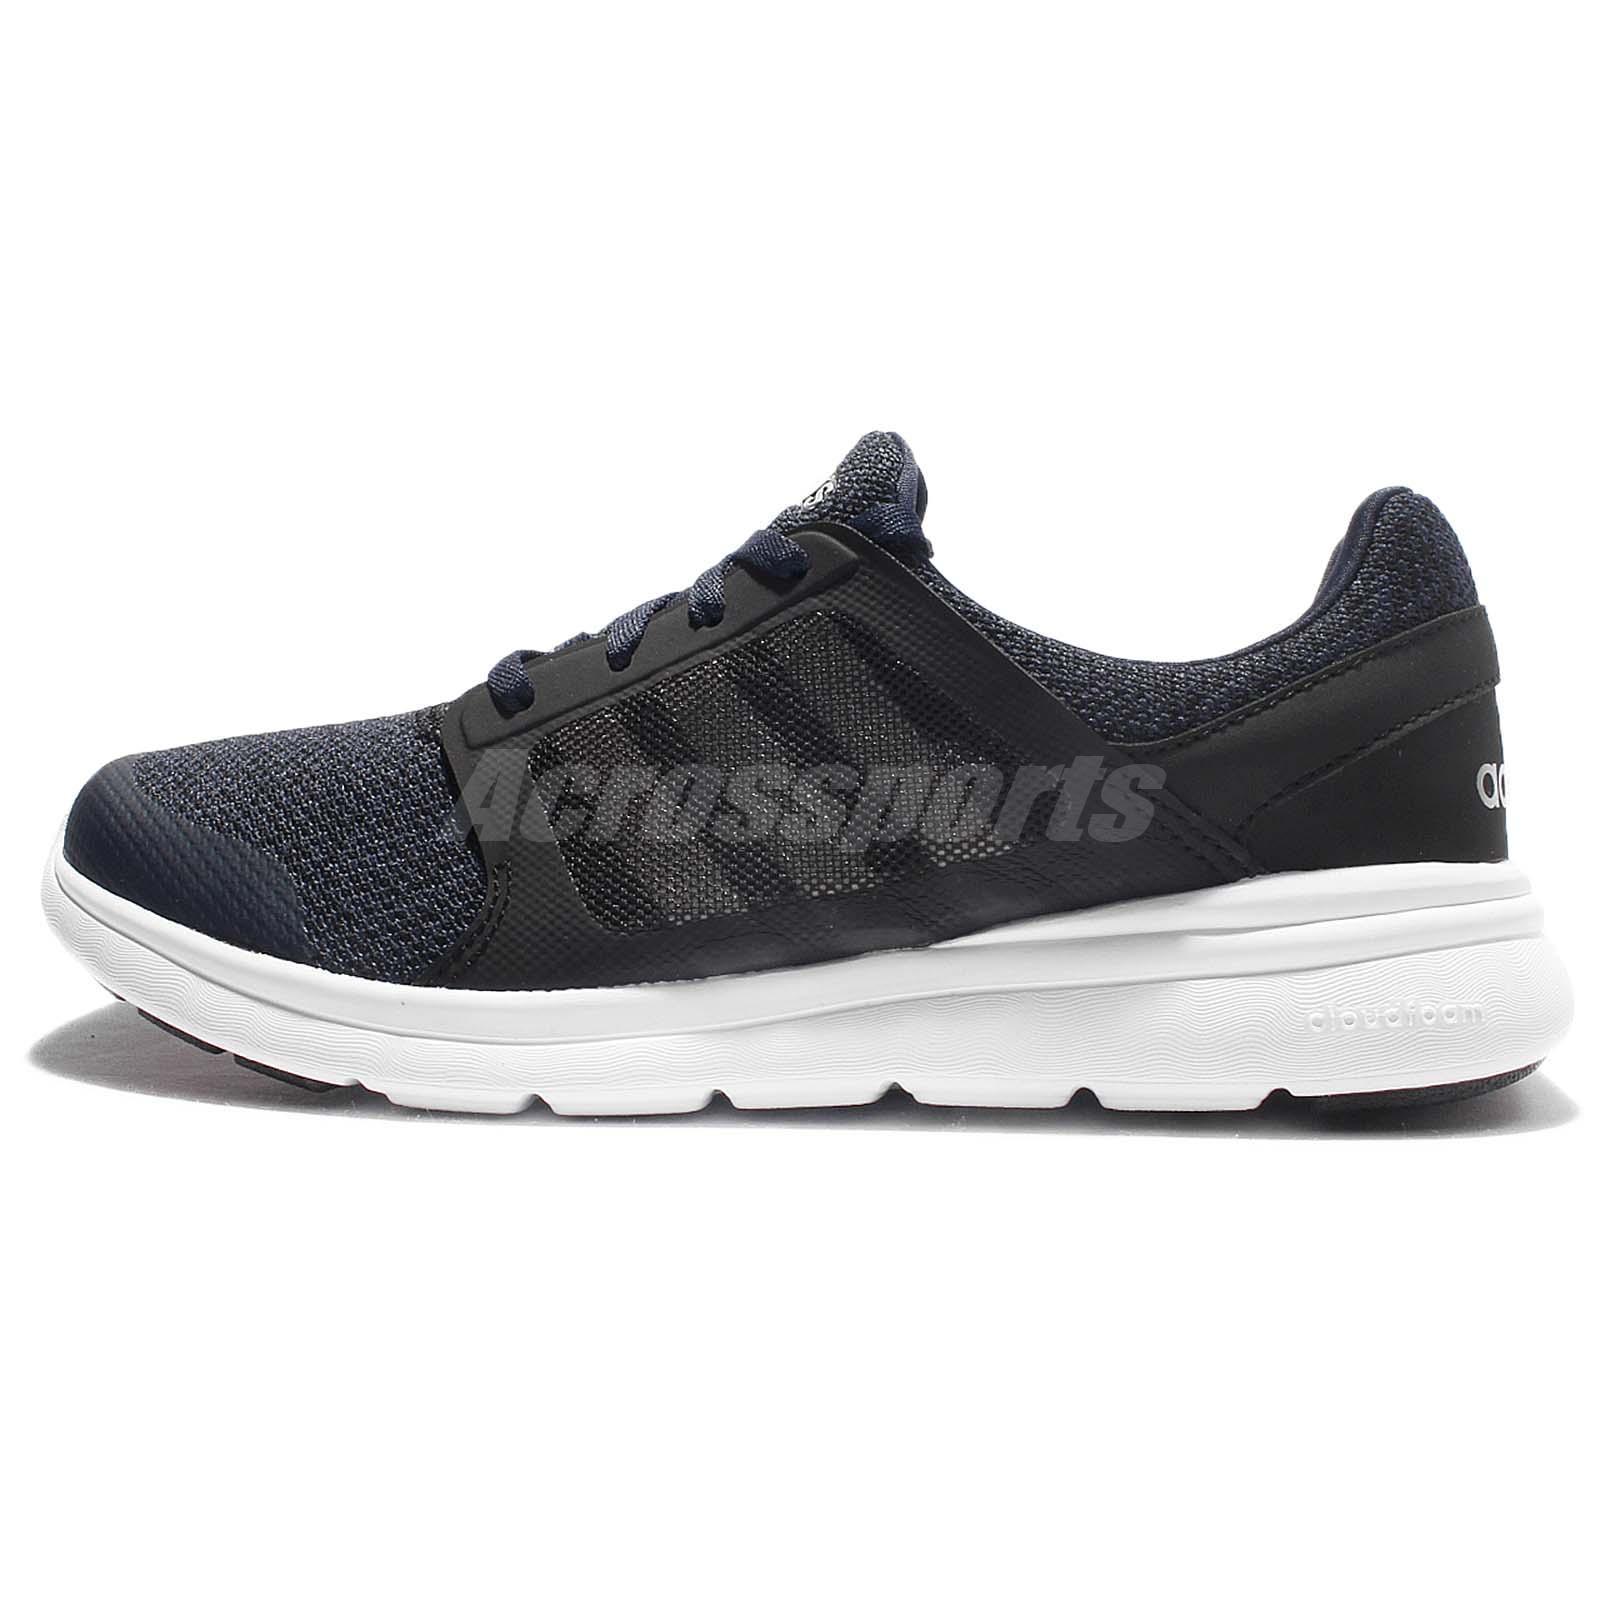 163b7082060 ... spain adidas cloudfoam xpression womens casual shoes 06c01 ccb91